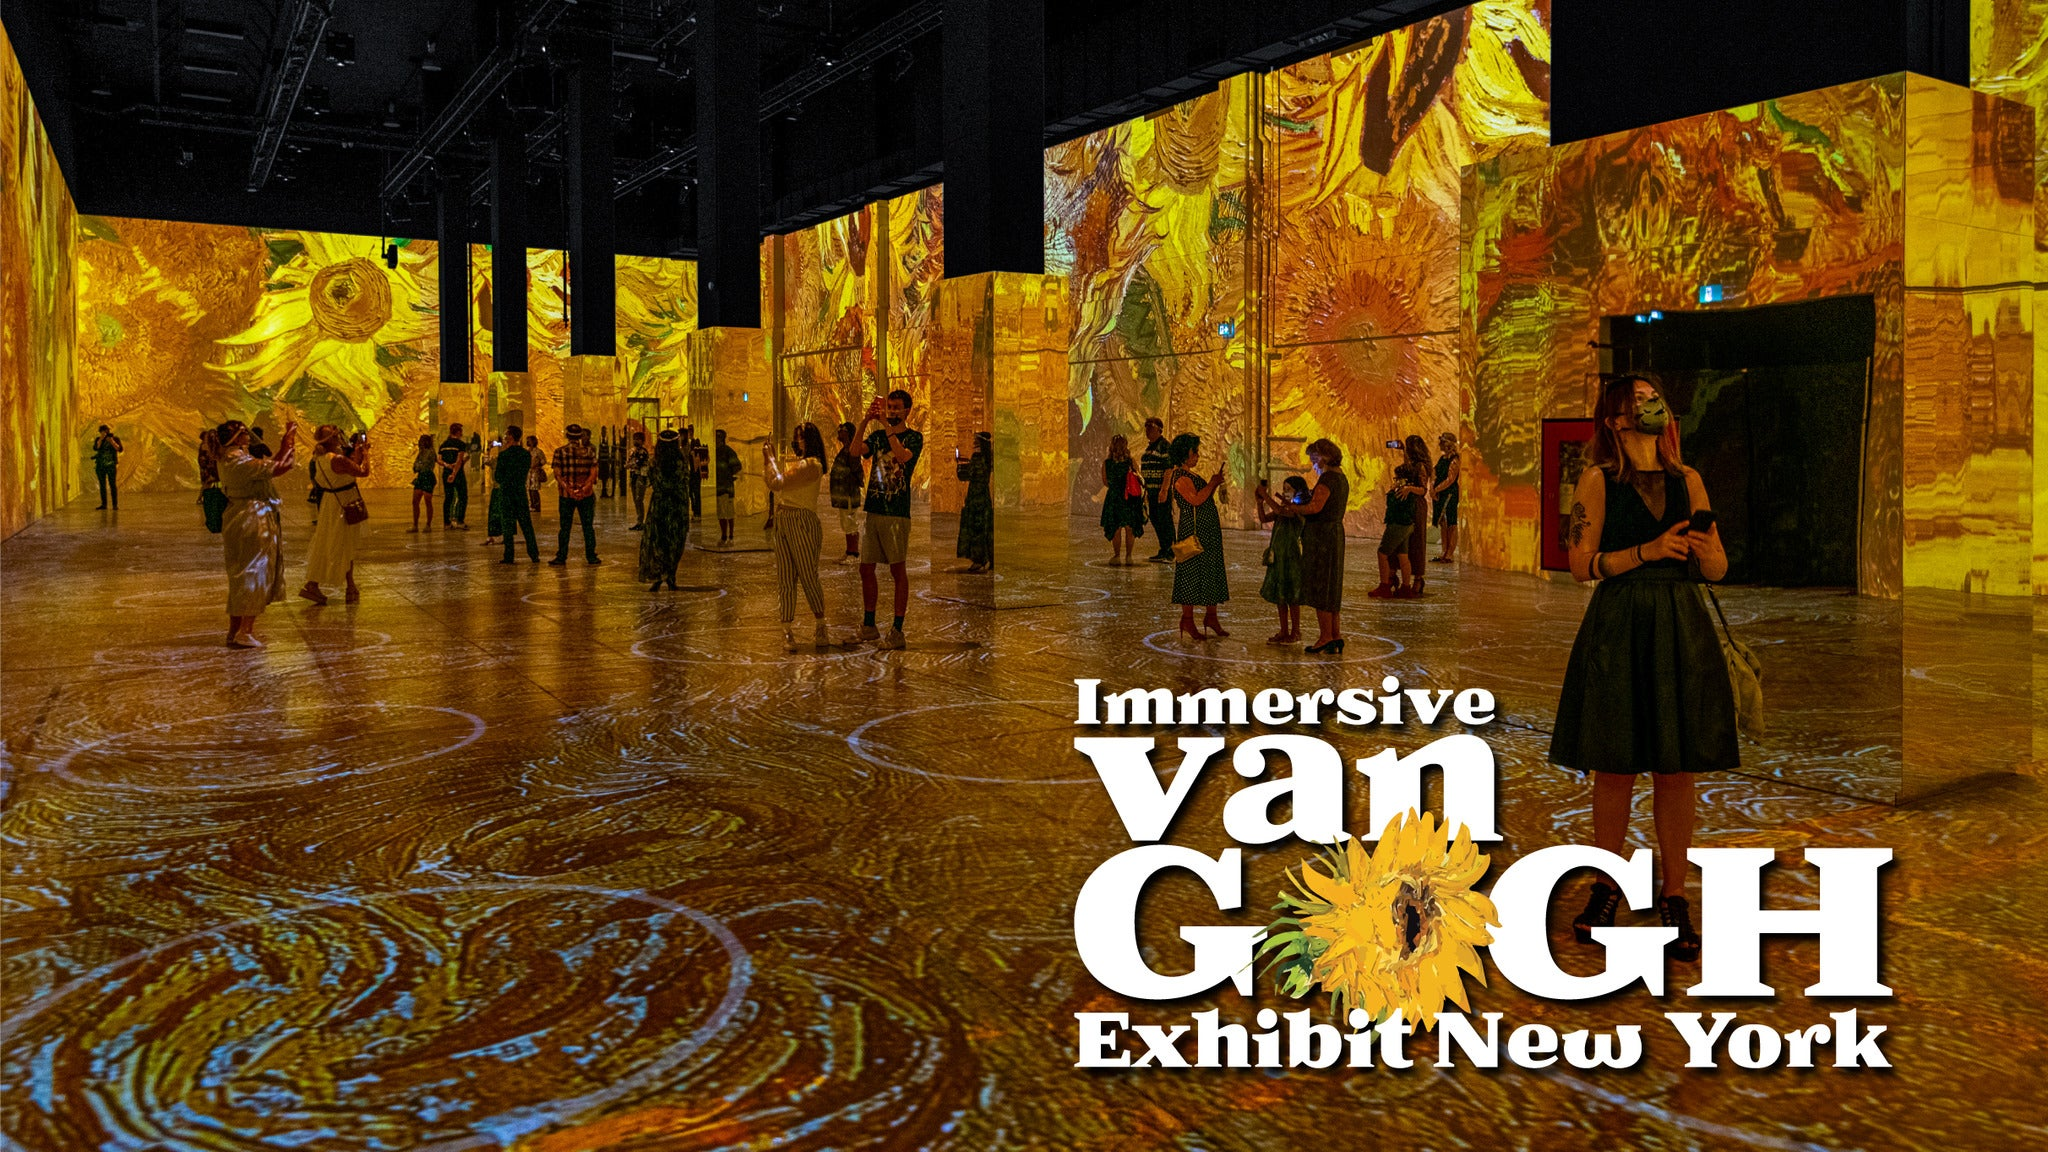 American Express Access - Immersive Van Gogh (PRIME)